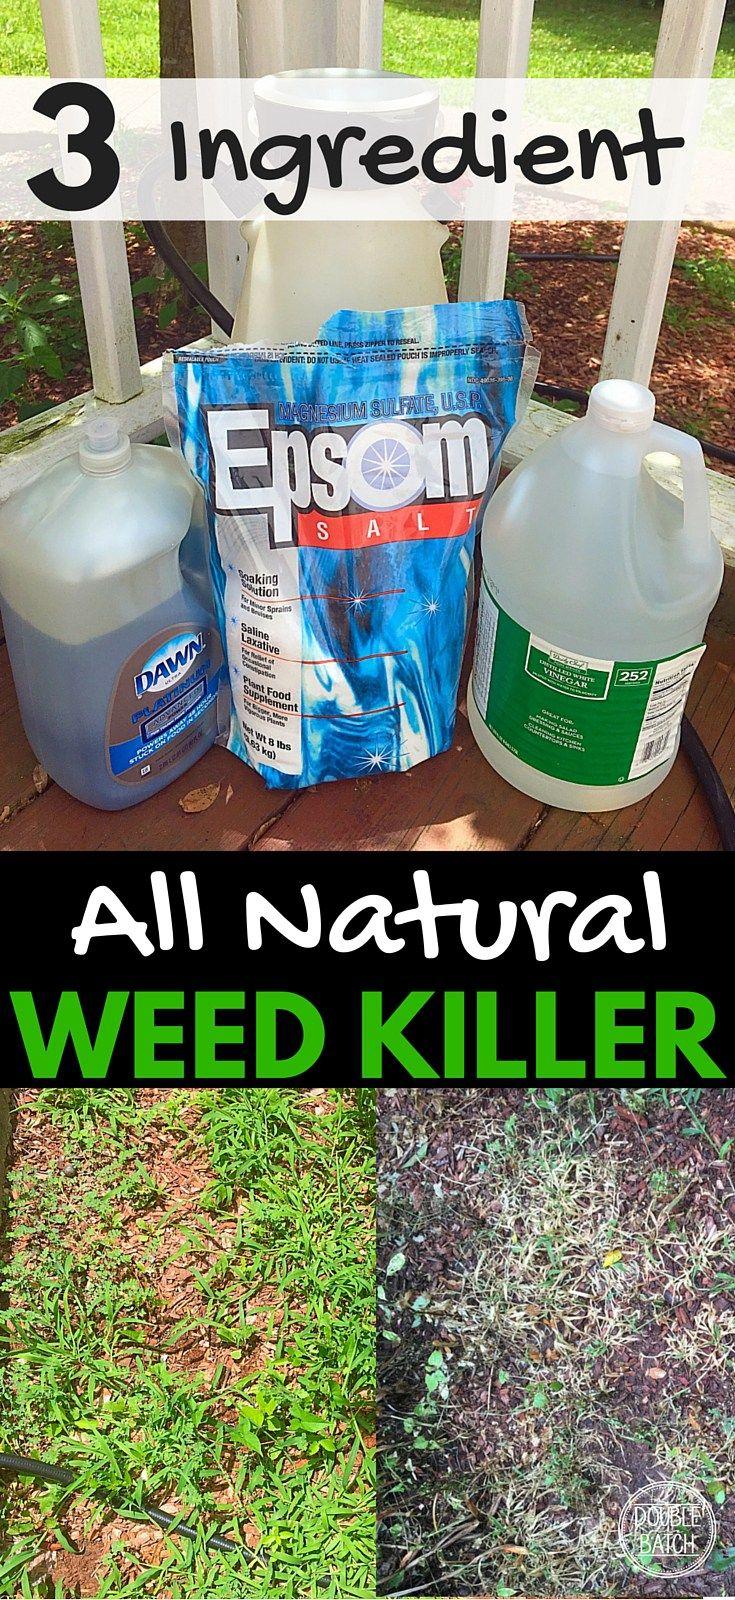 ingredient natural weed killer u homemade weed killer recipe